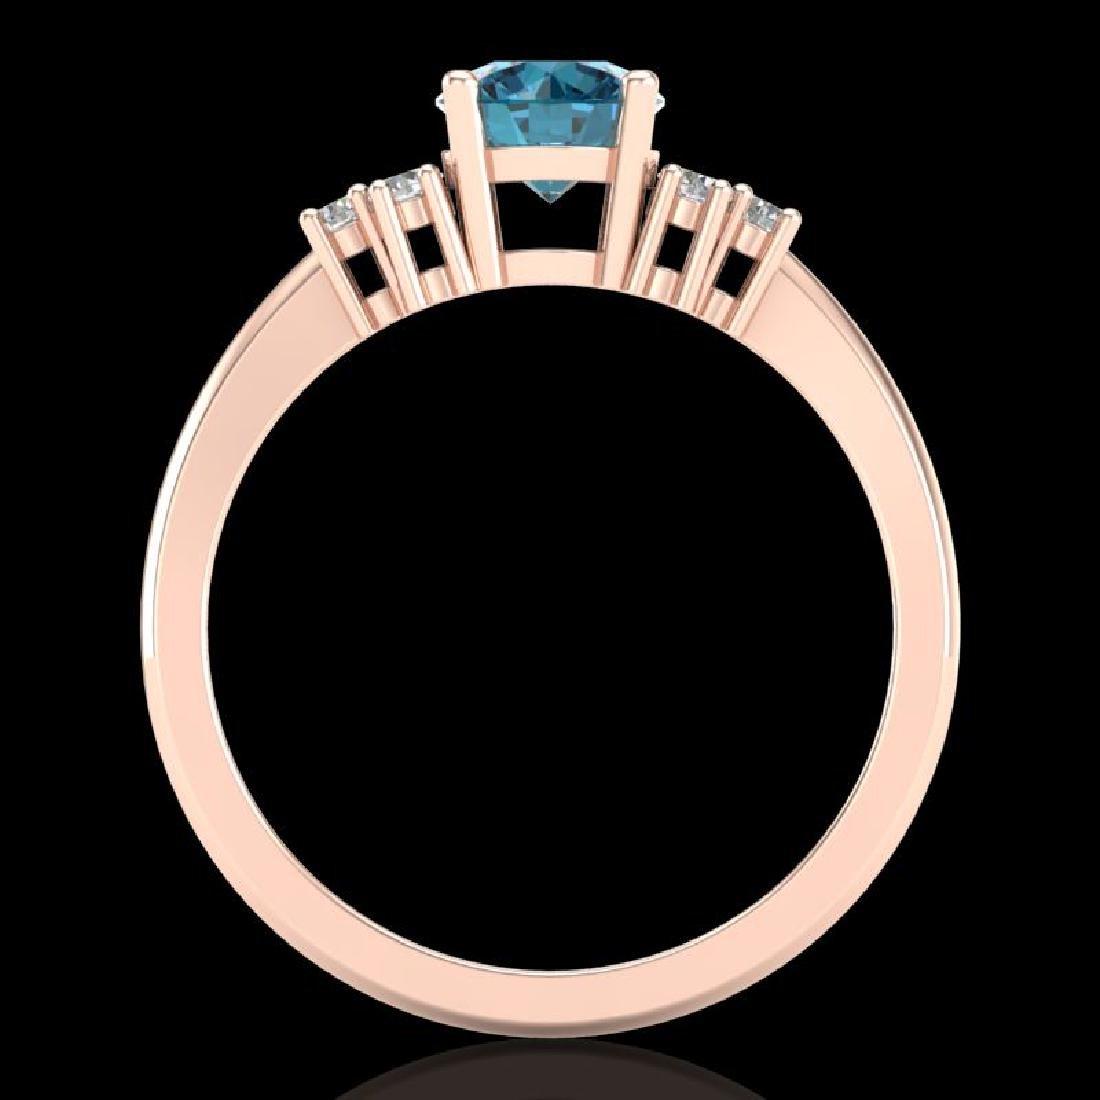 1 CTW Fancy Intense Blue Diamond Engagement Classic - 3